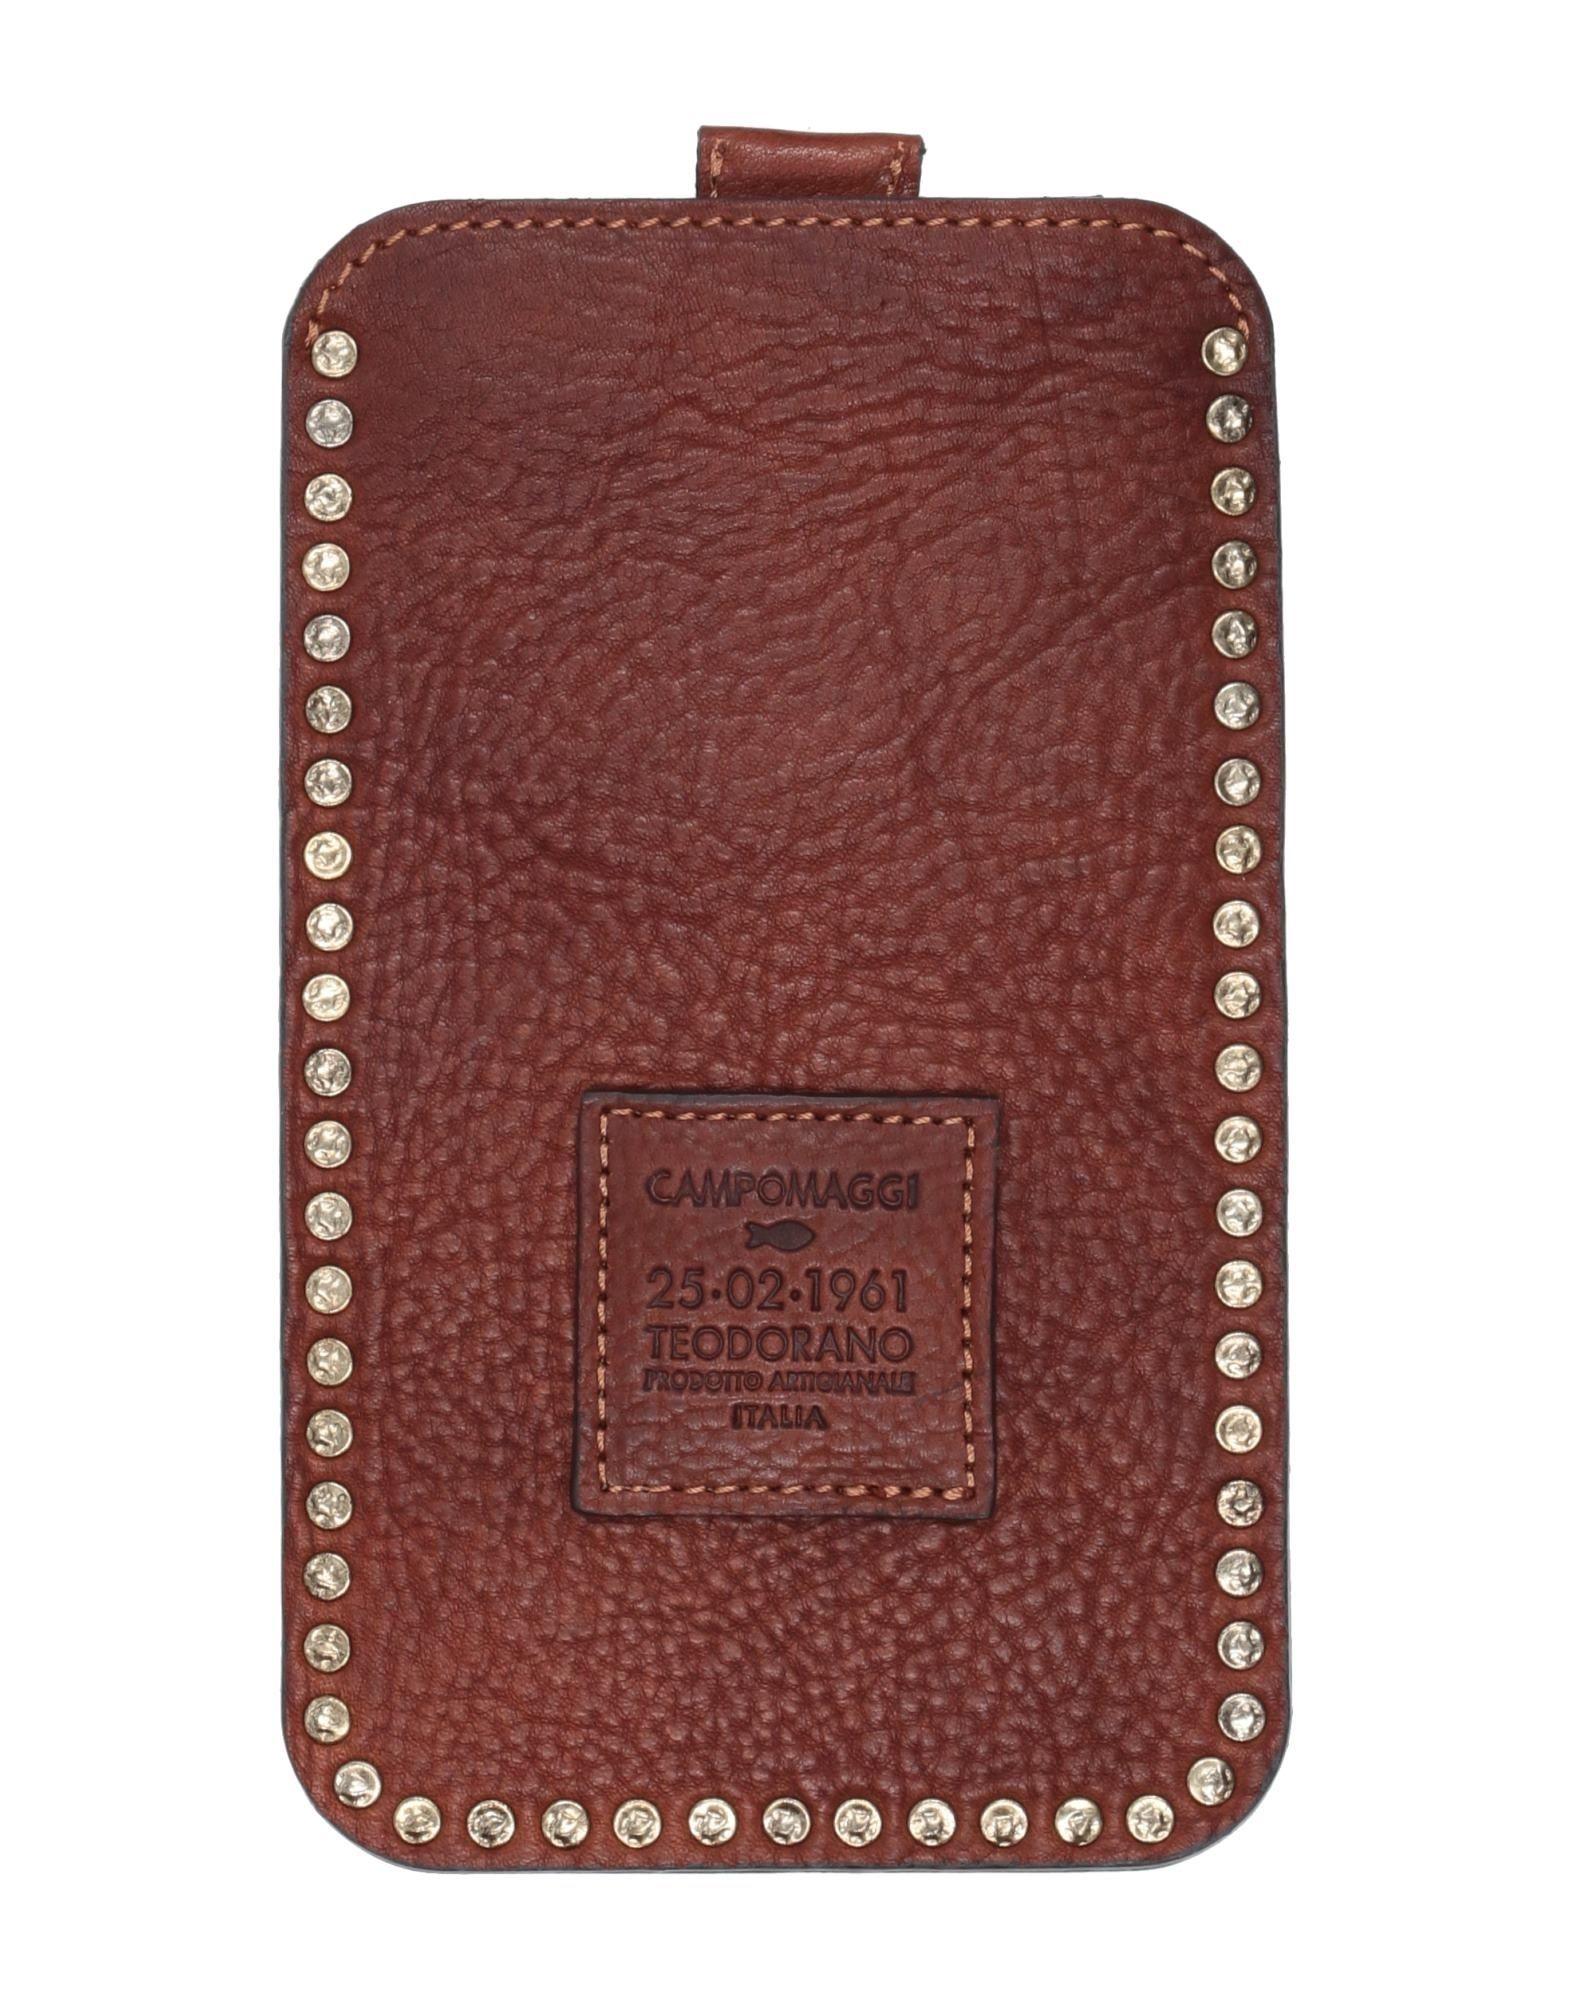 Фото - CAMPOMAGGI Чехол чехол накладка для apple iphone 6 6s deppa gel plus case 85213 pink клип кейс полиуретан